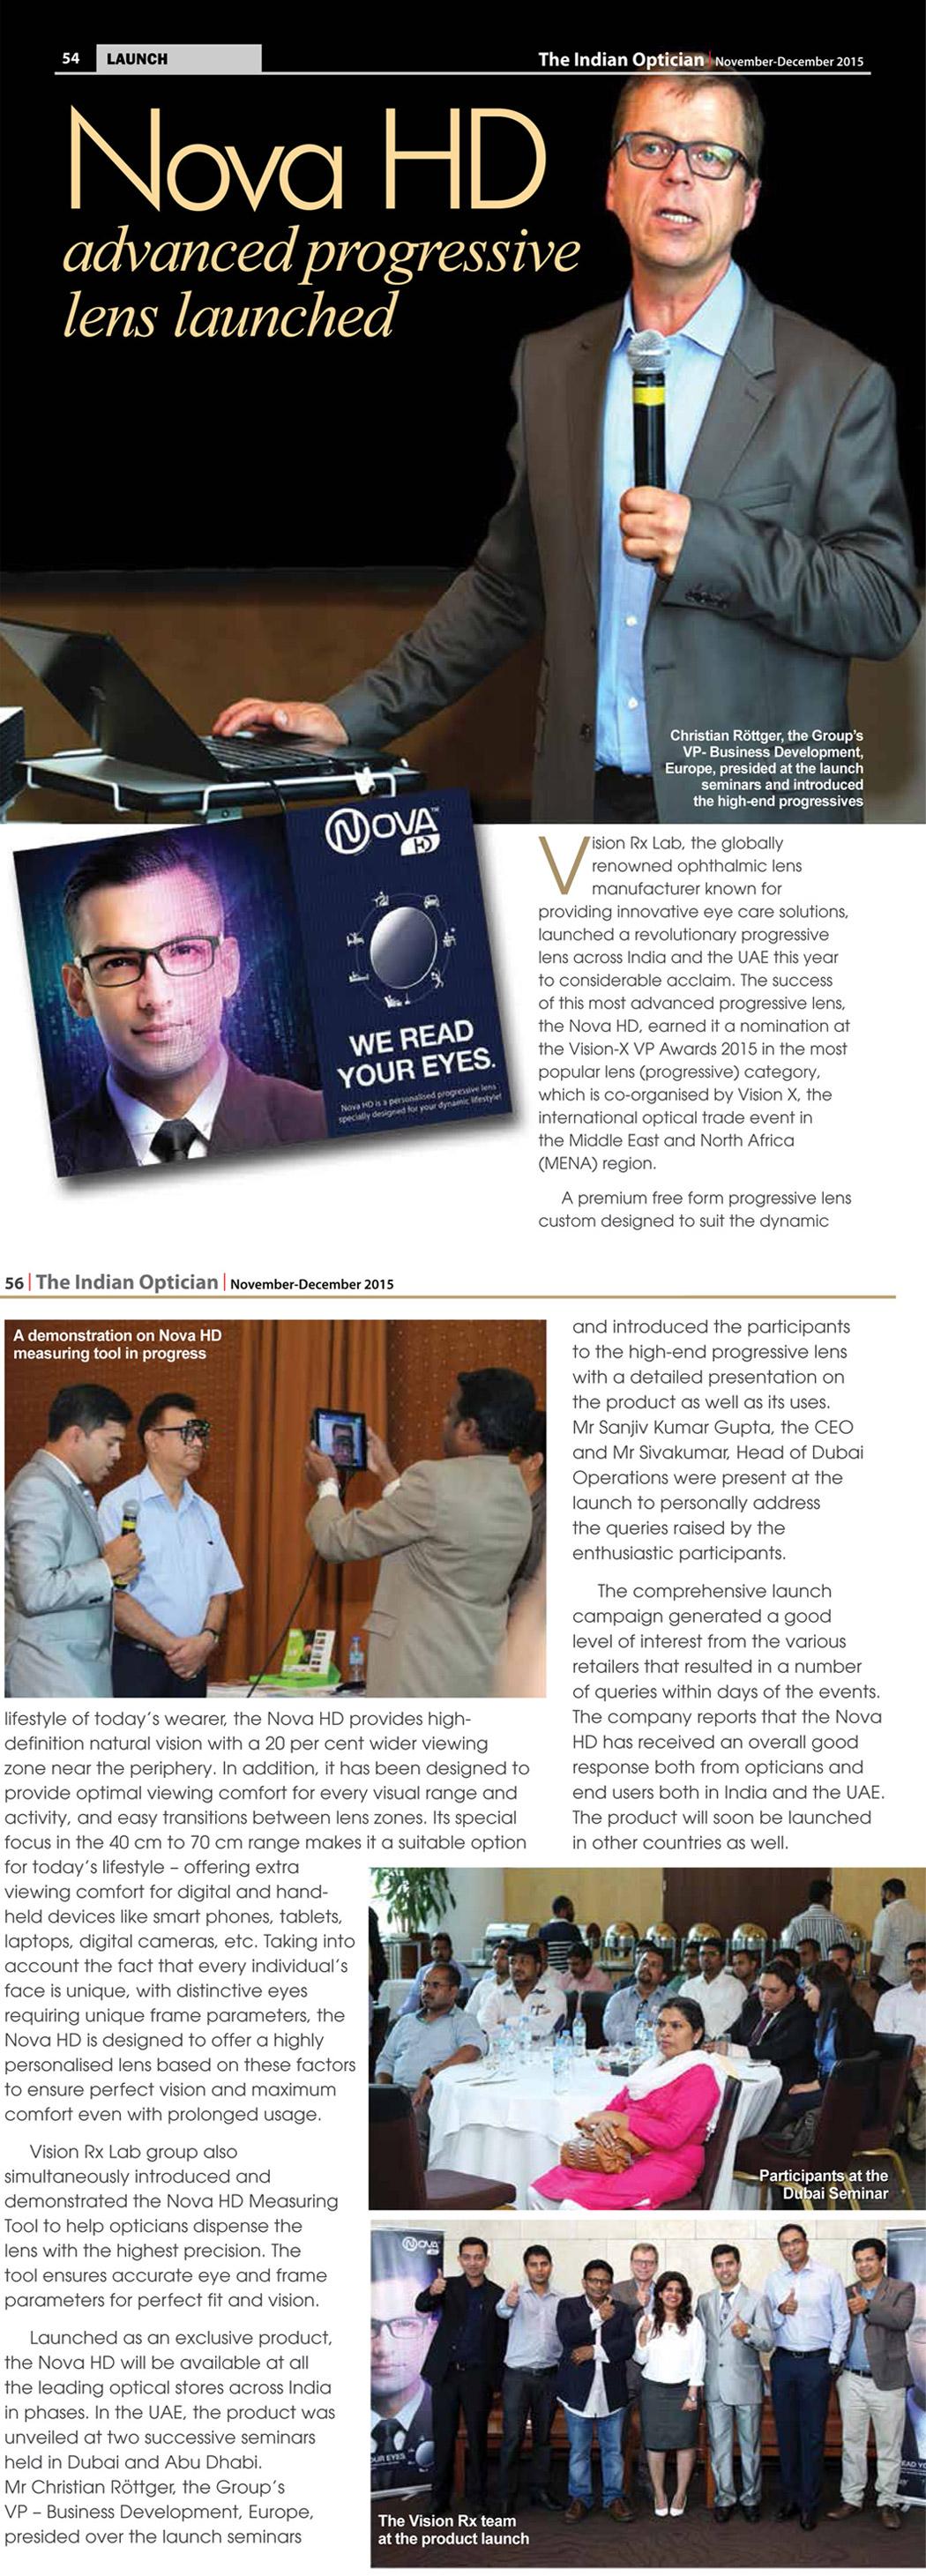 The Indian Optician covers Nova HD Launch